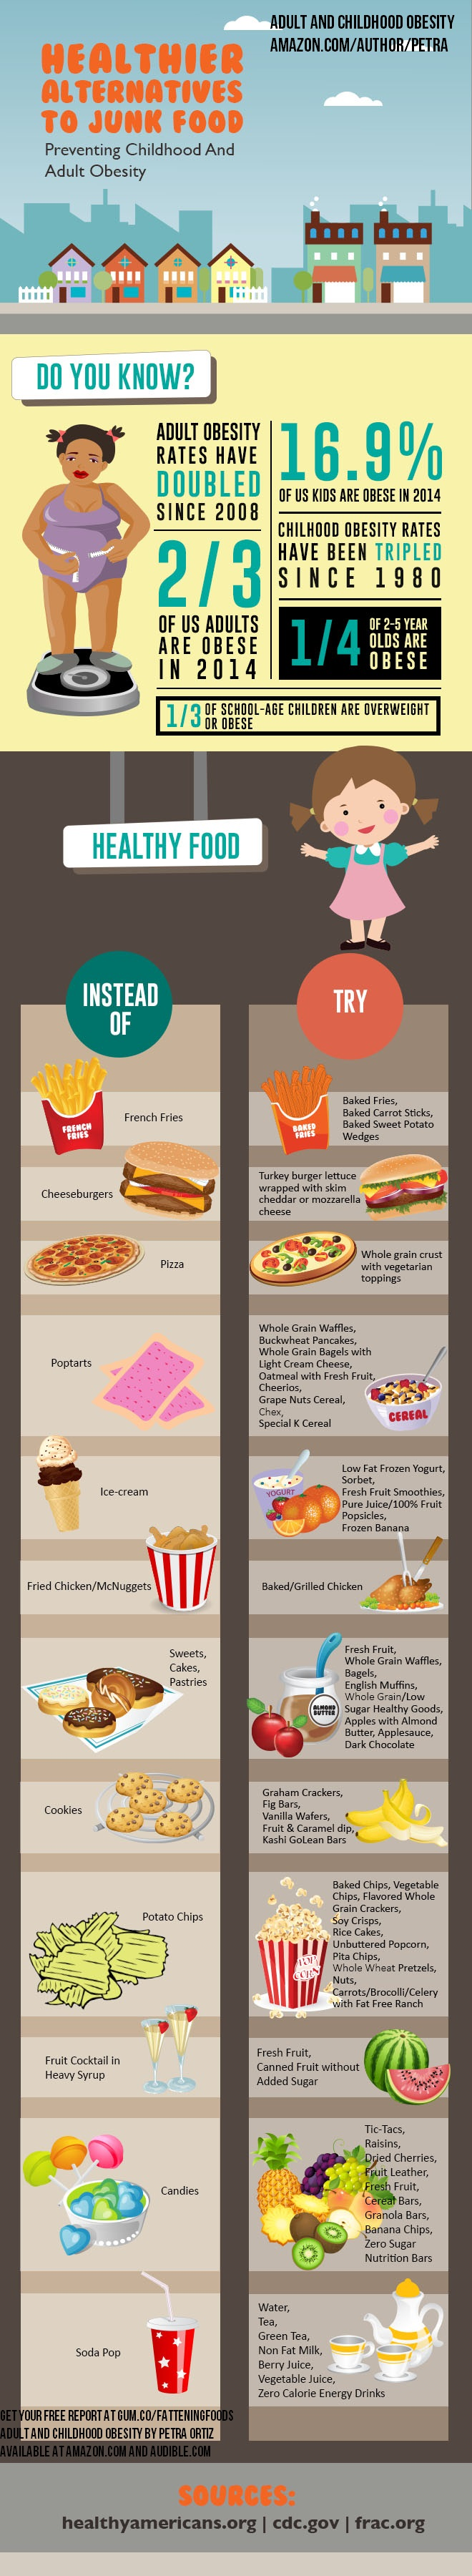 impact of junk food on health